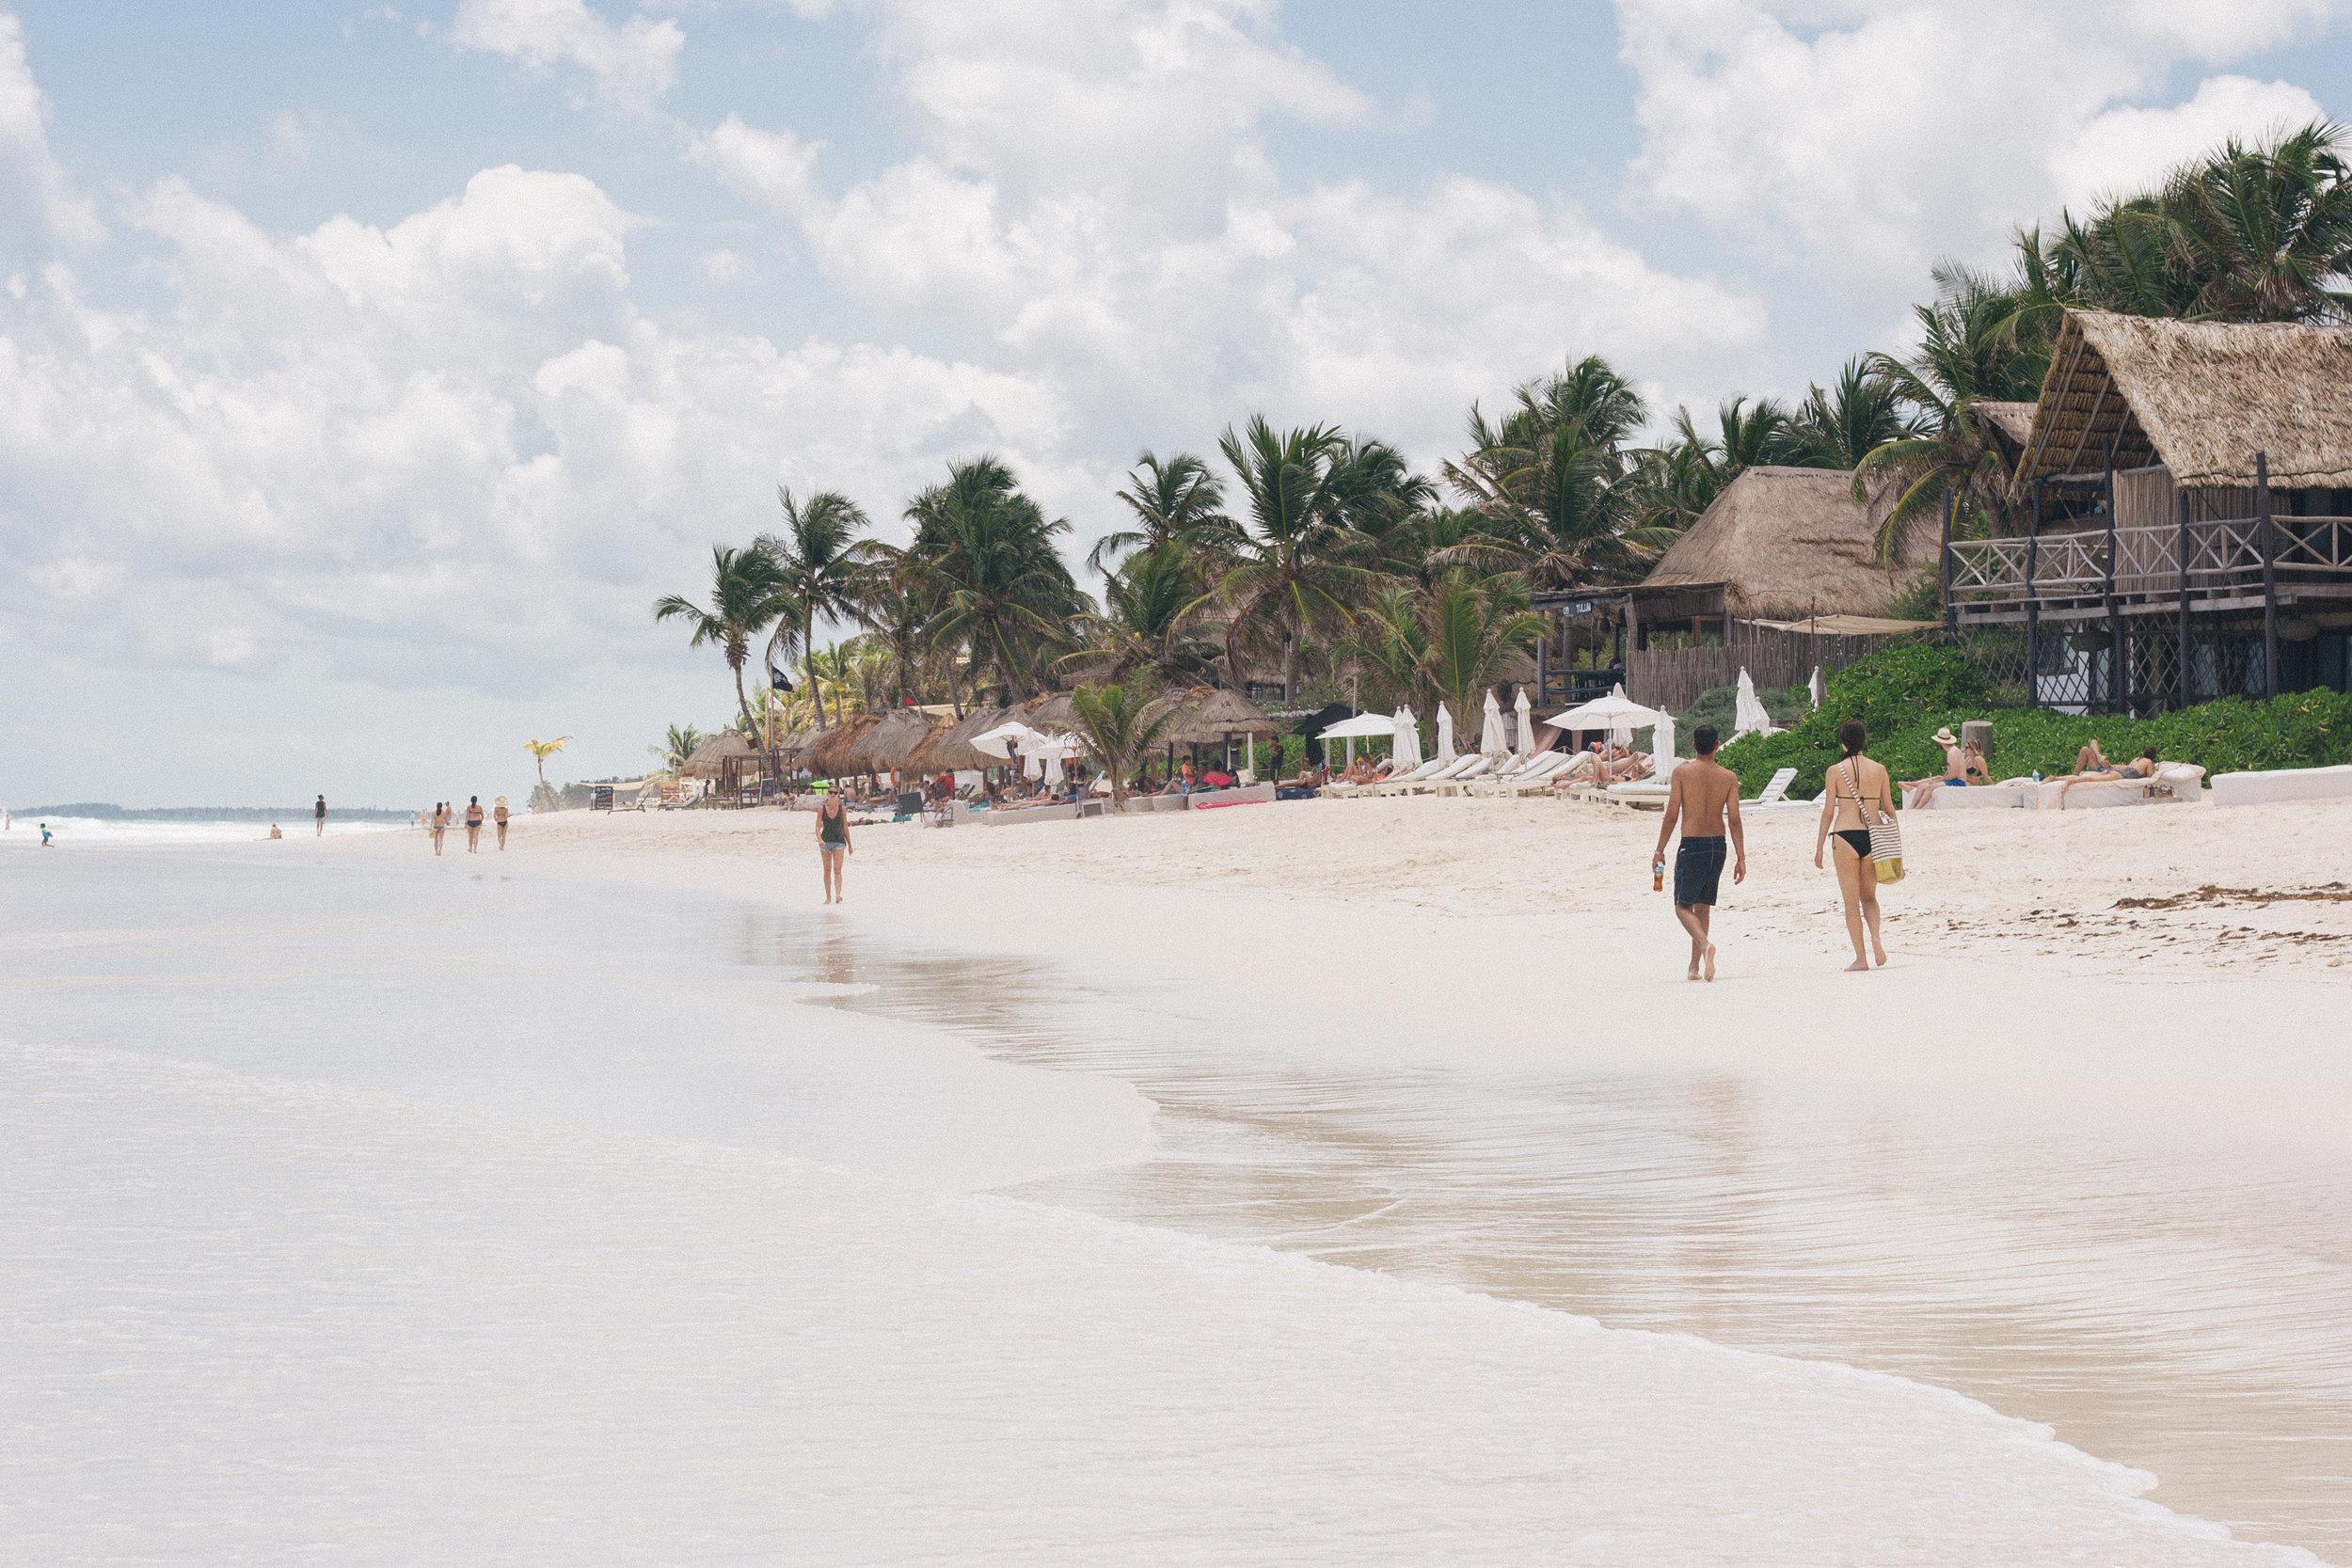 Mexico-3860.jpg